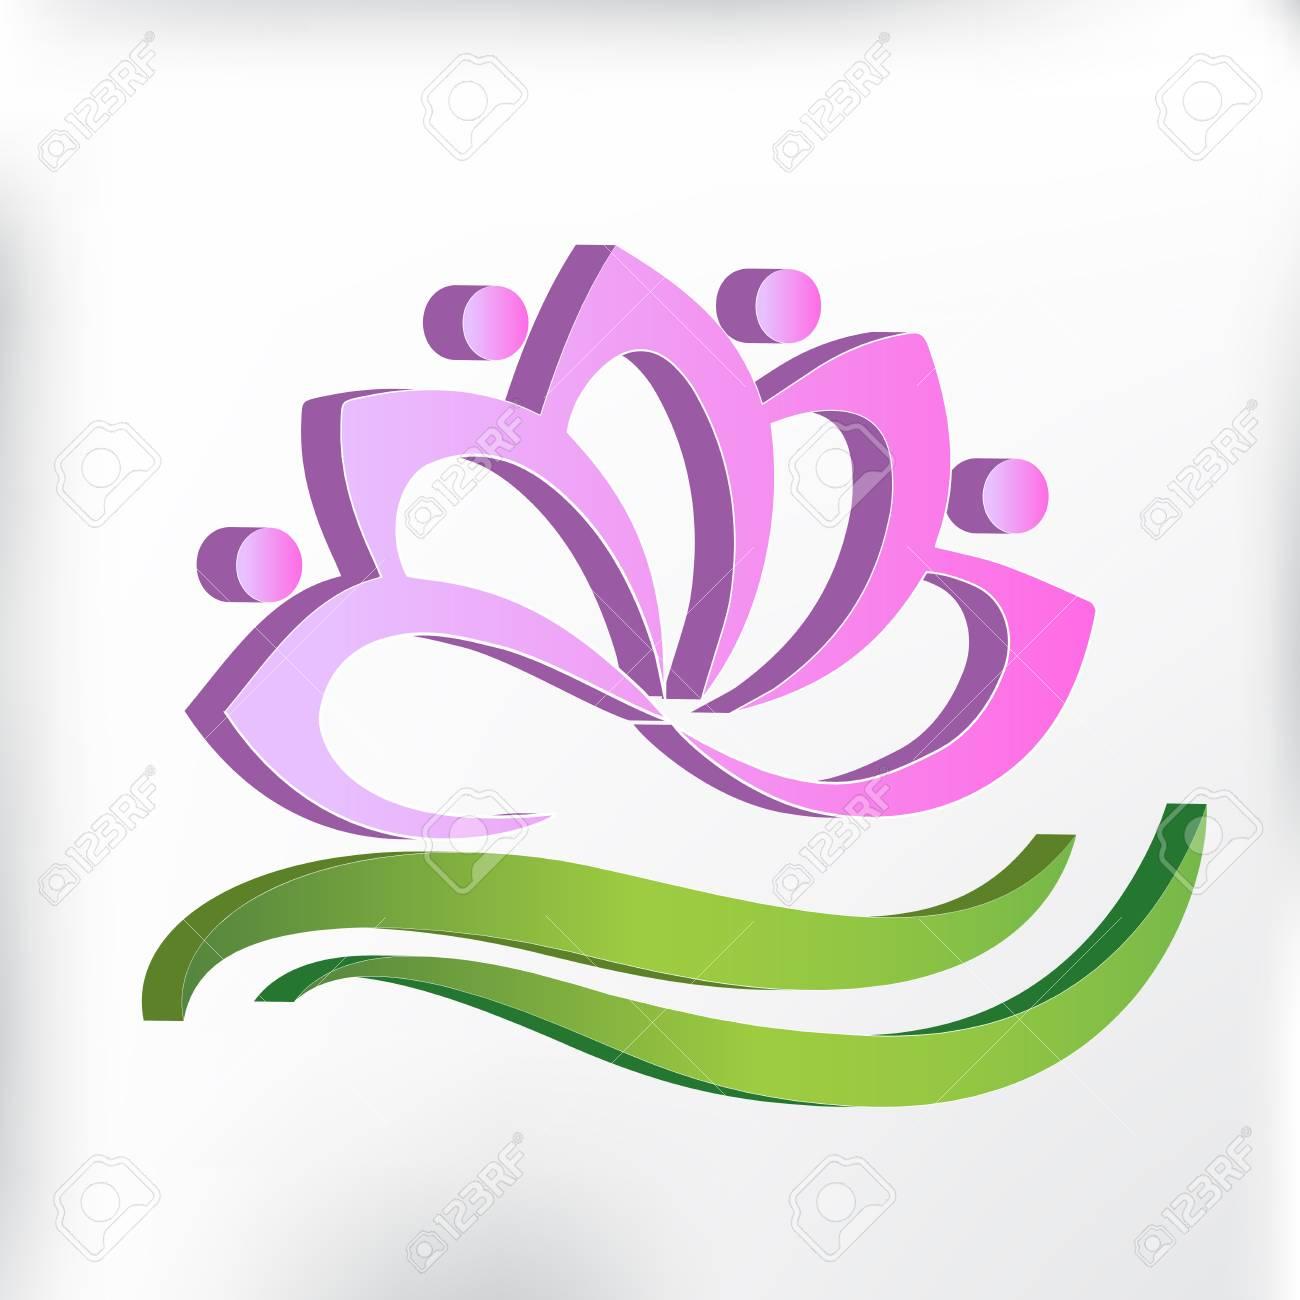 Pink lotus flower spa massage symbol logo for id card royalty free pink lotus flower spa massage symbol logo for id card stock vector 91654501 izmirmasajfo Gallery